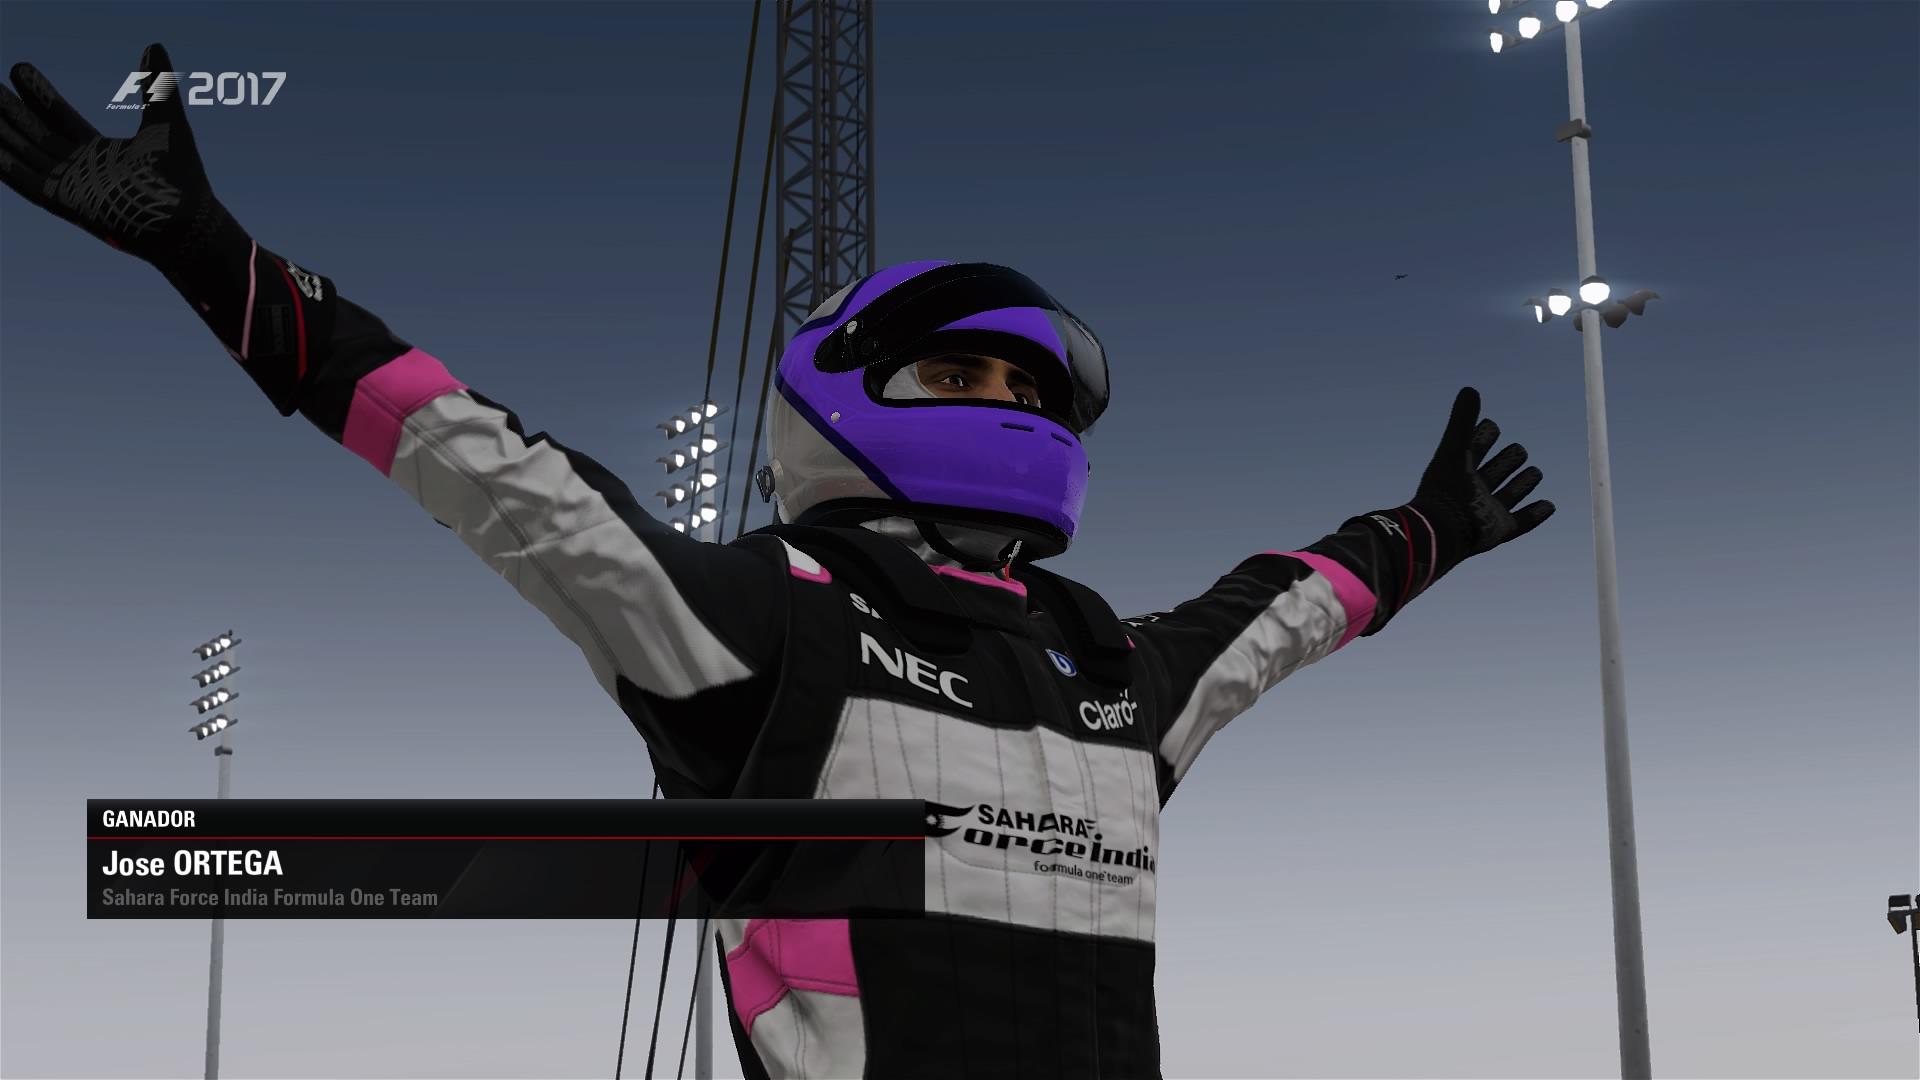 F1 2017 - 8